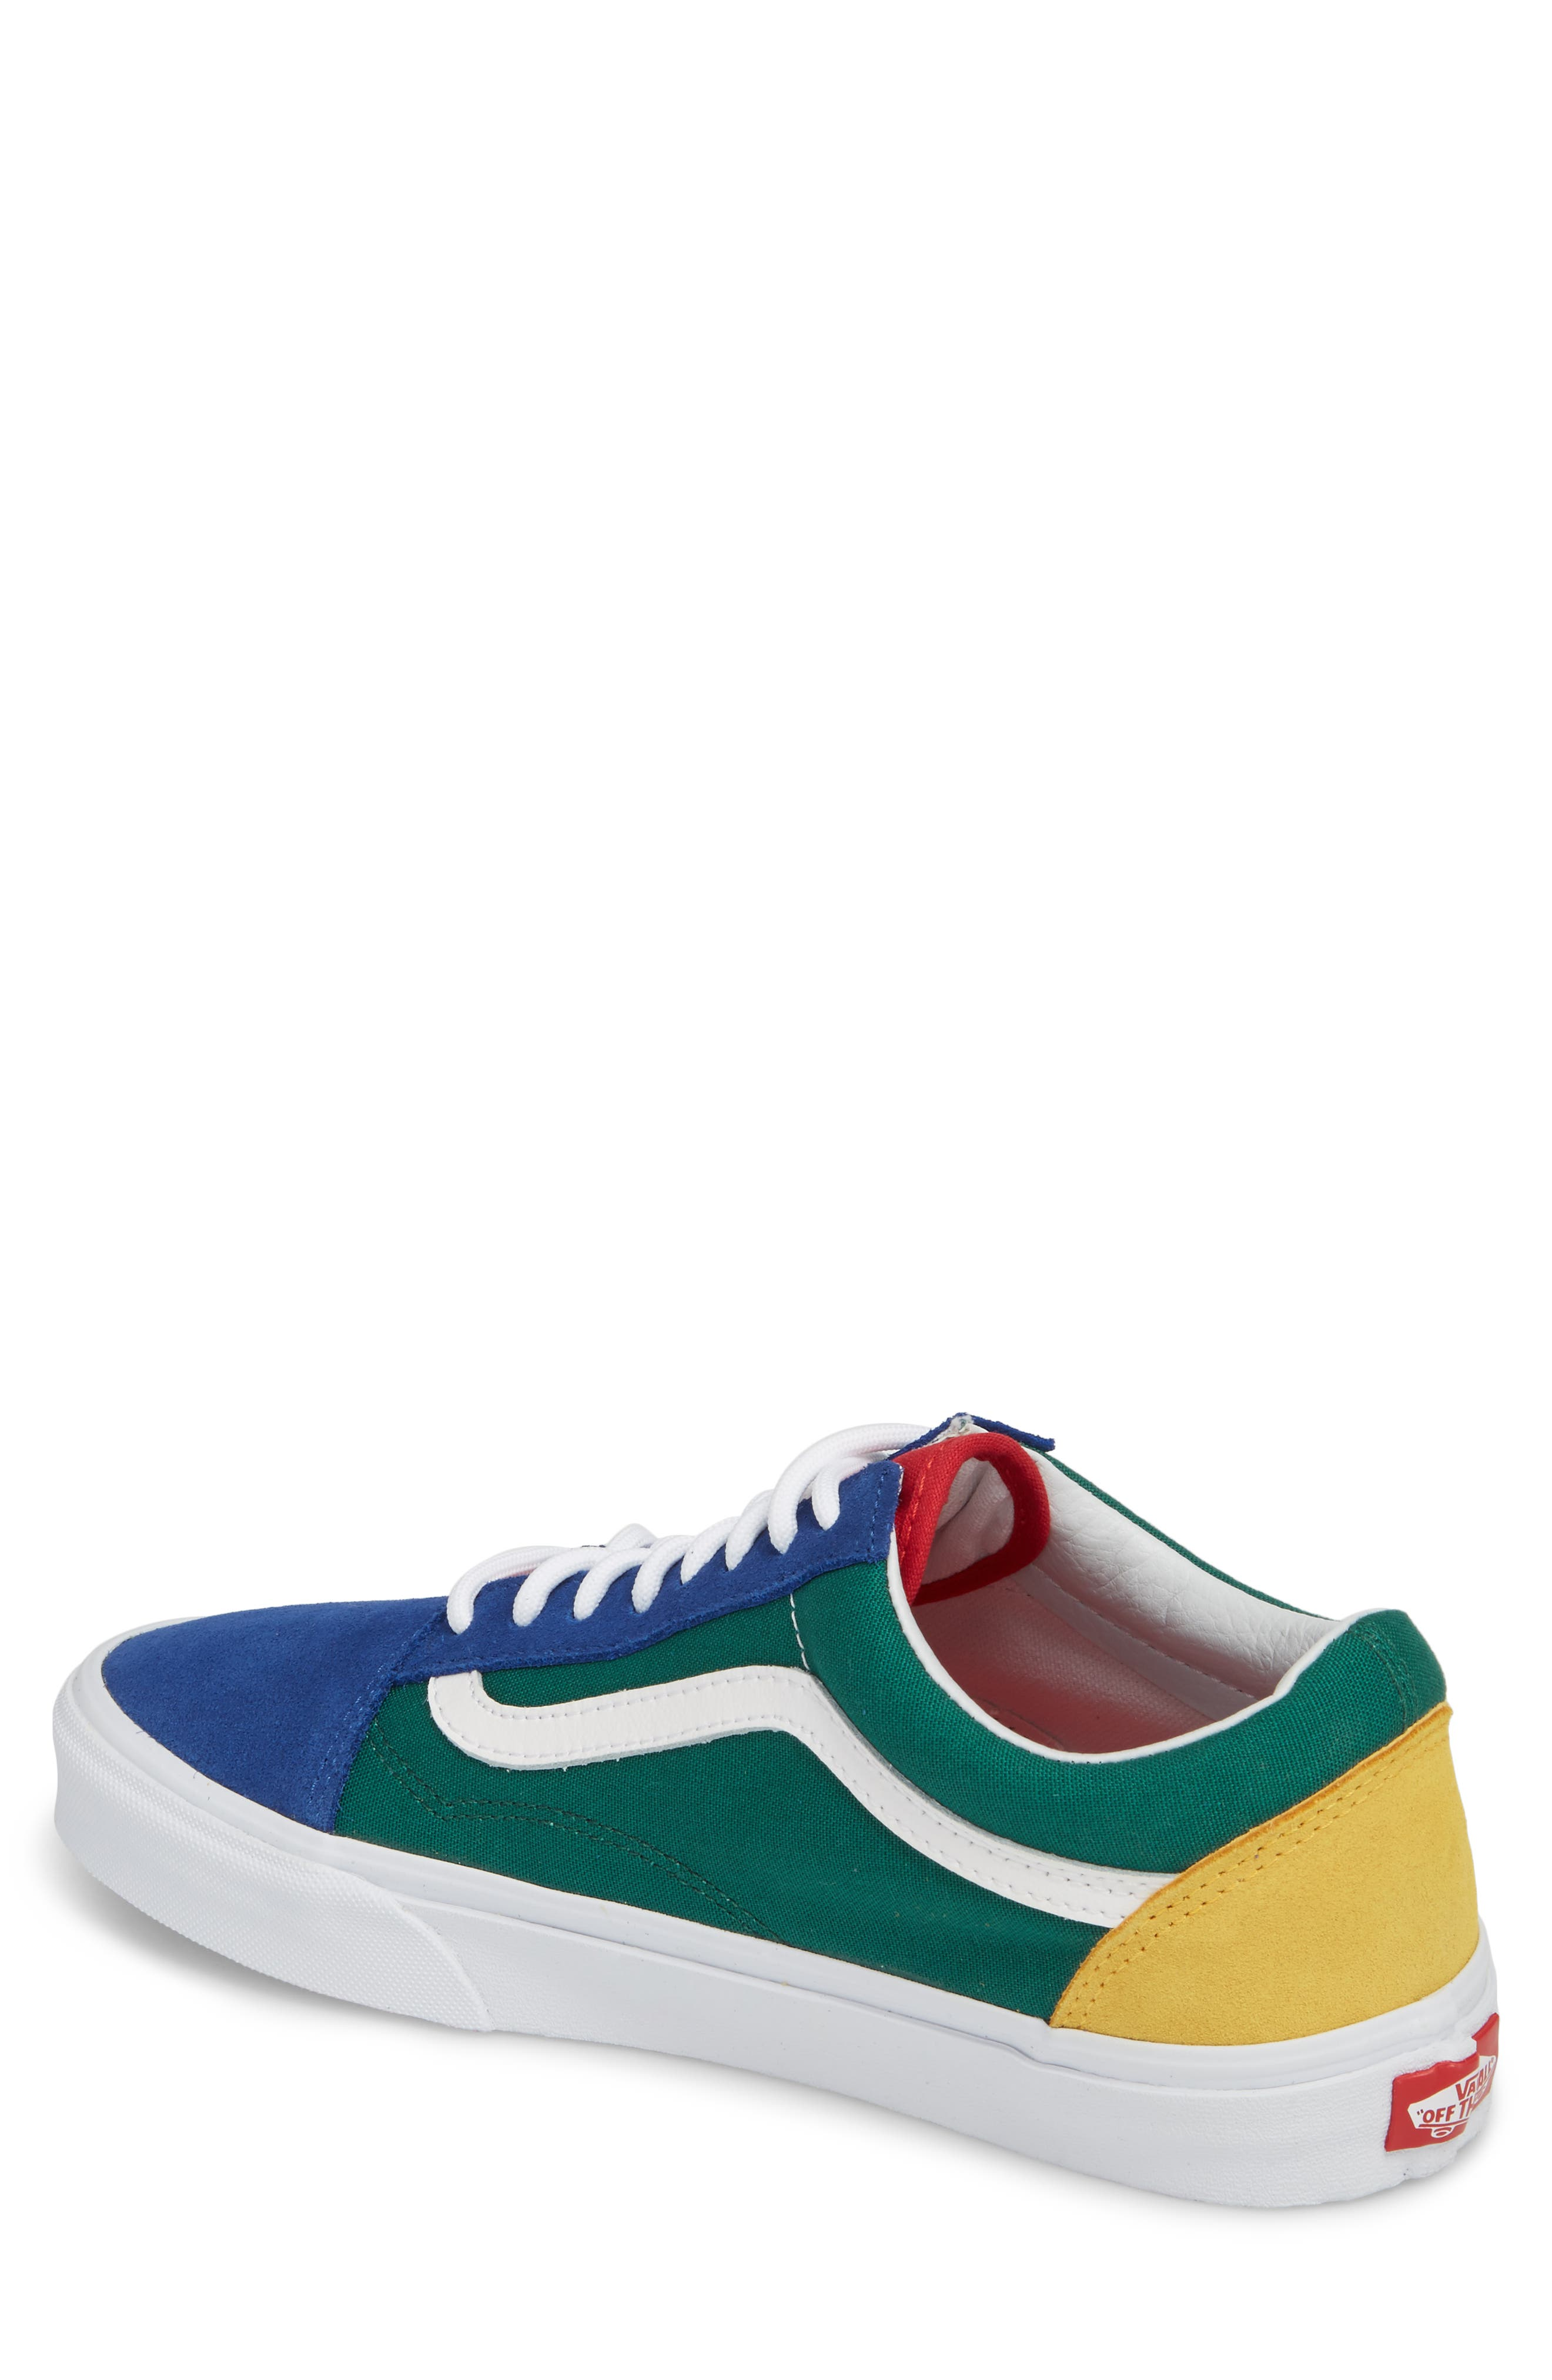 Yacht Club Old Skool Sneaker,                             Alternate thumbnail 2, color,                             300